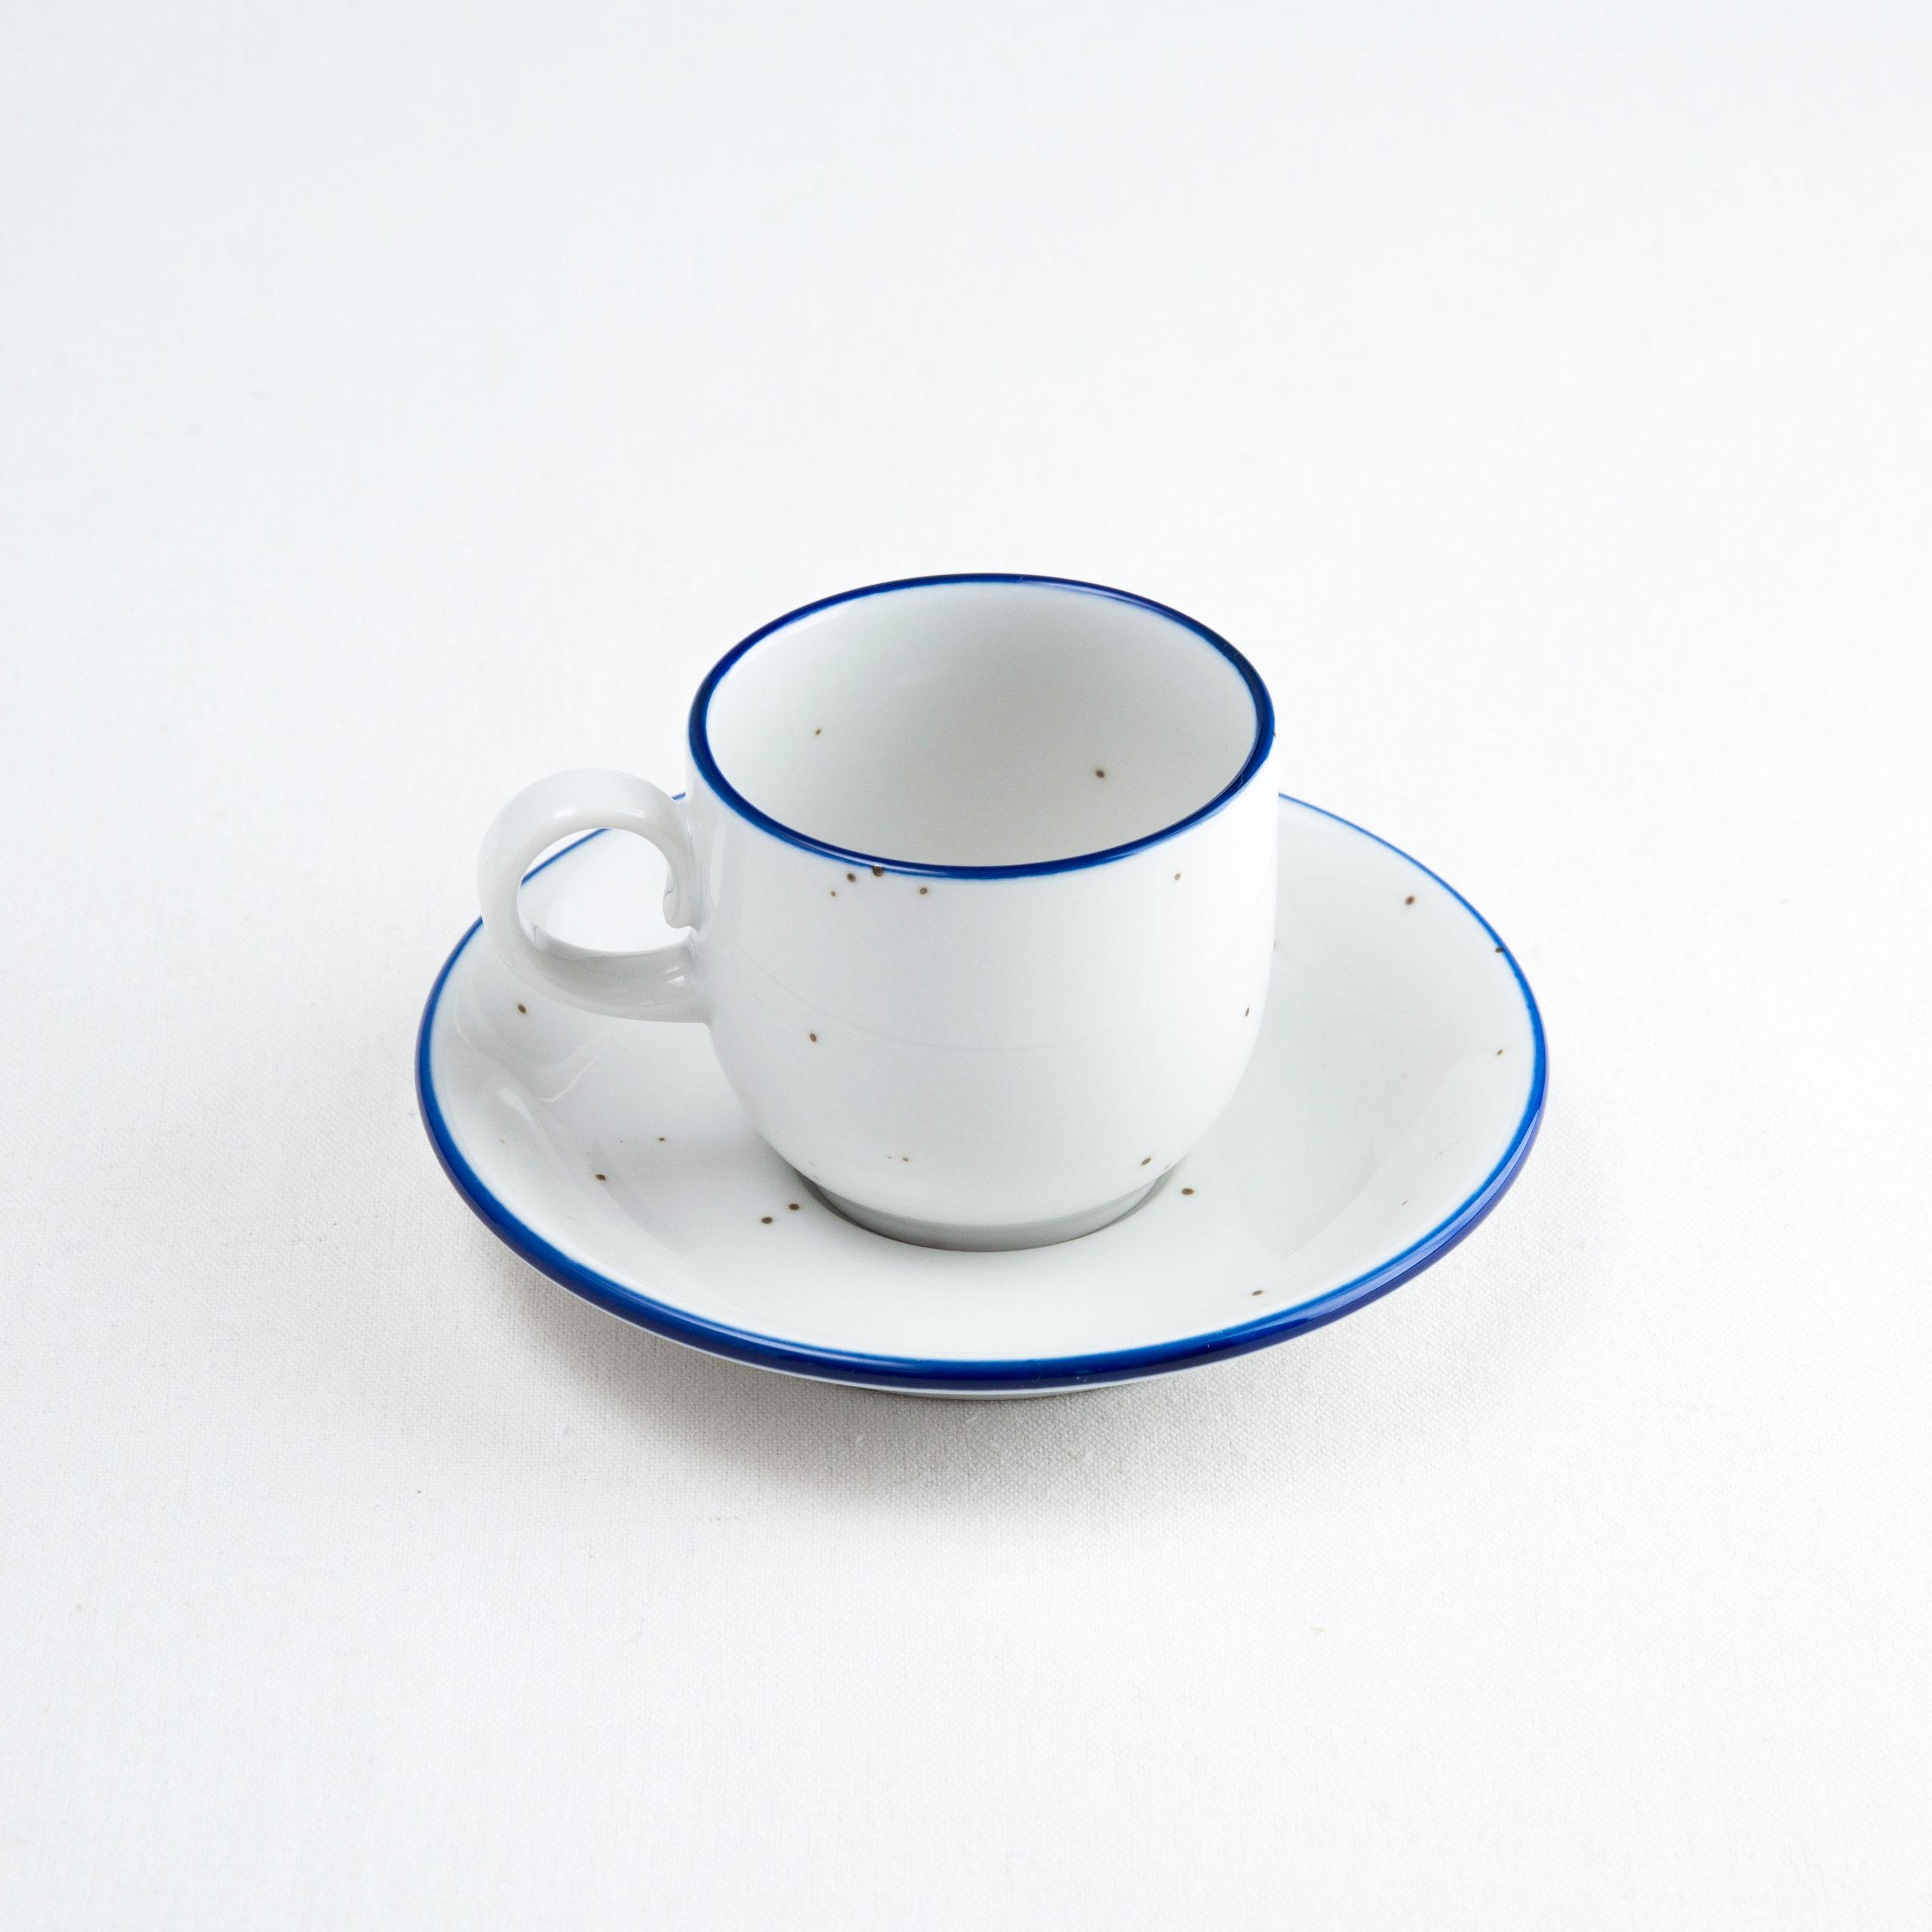 Shemoa Blue コーヒーカップ